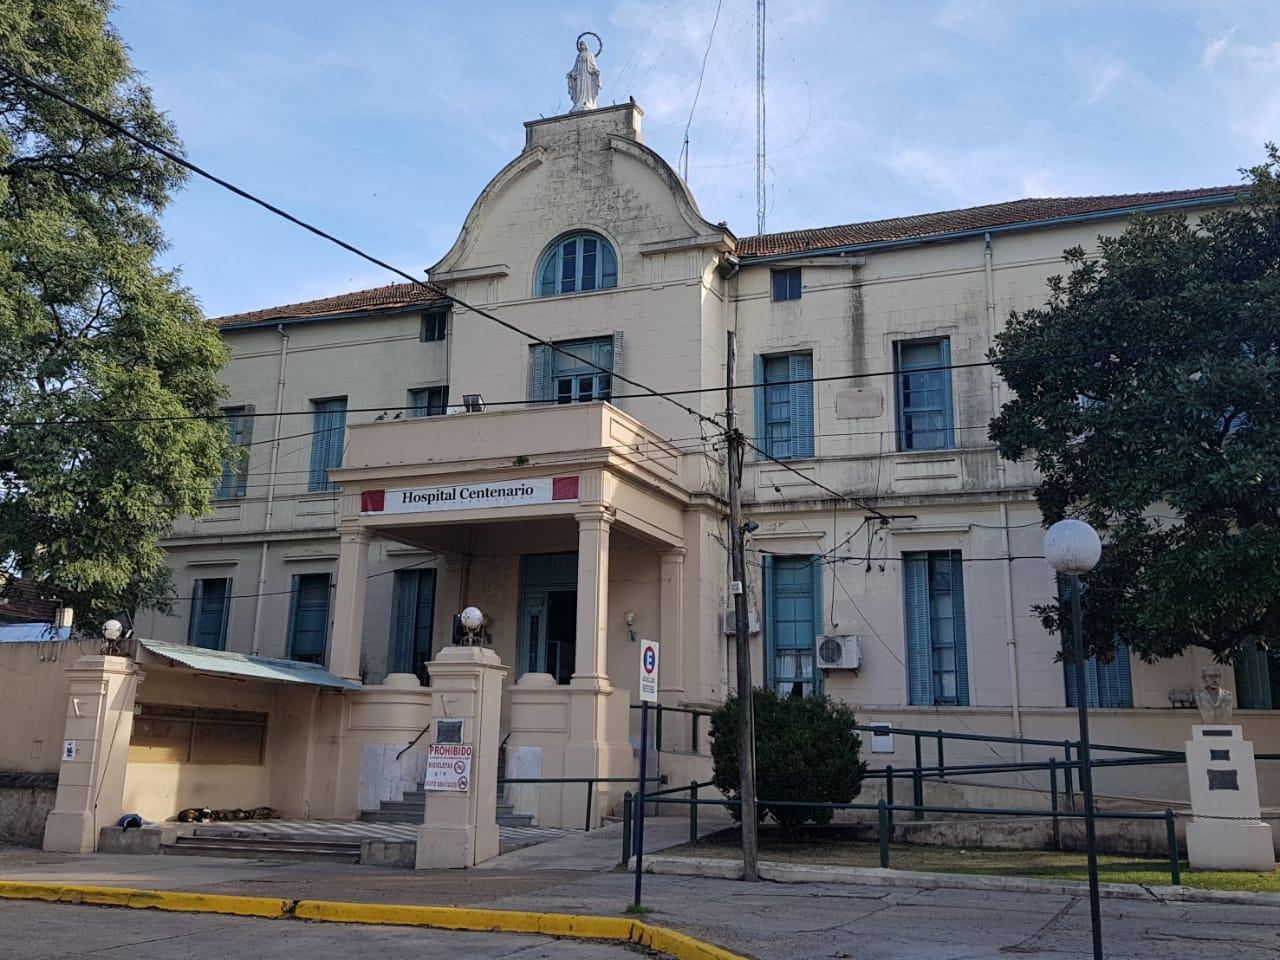 Coronaviurs: Se registró una nueva muerte en Gualeguaychú